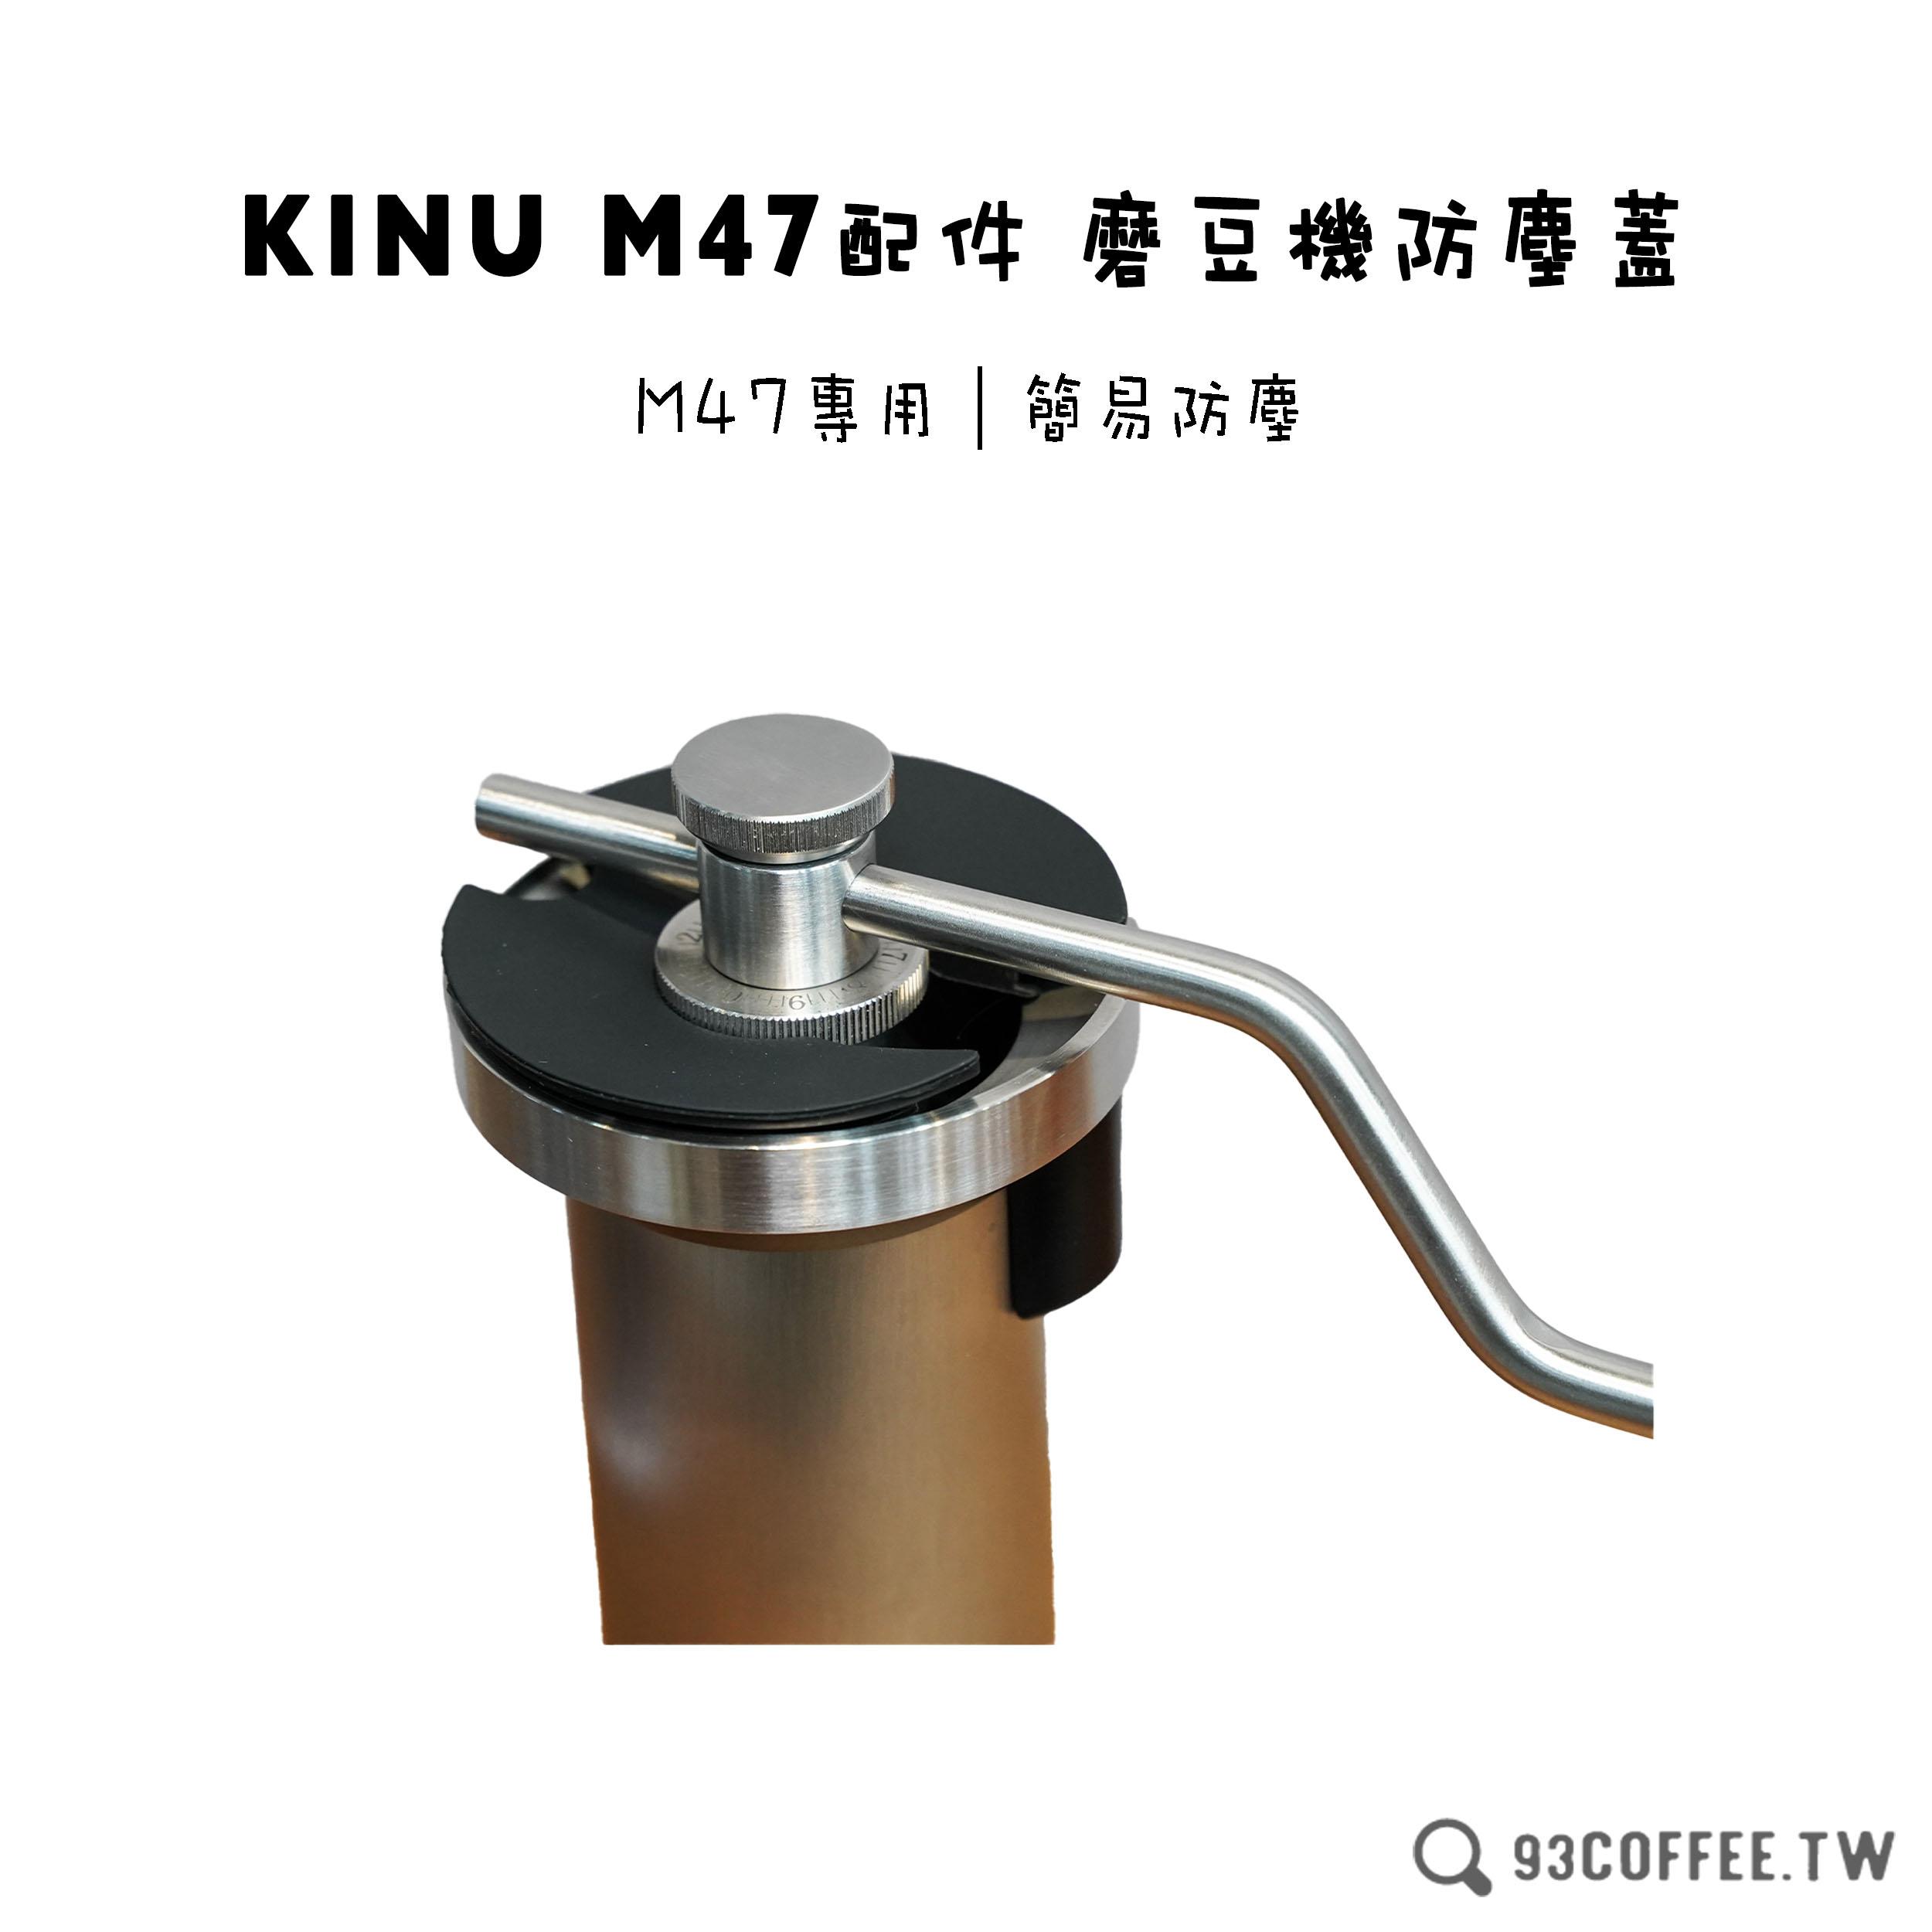 93 Coffee Wholesale 玖參咖啡批發 德國Kinu M47頂級手搖磨豆機配件 專用防塵蓋 防跳豆蓋『93 coffee wholesale』